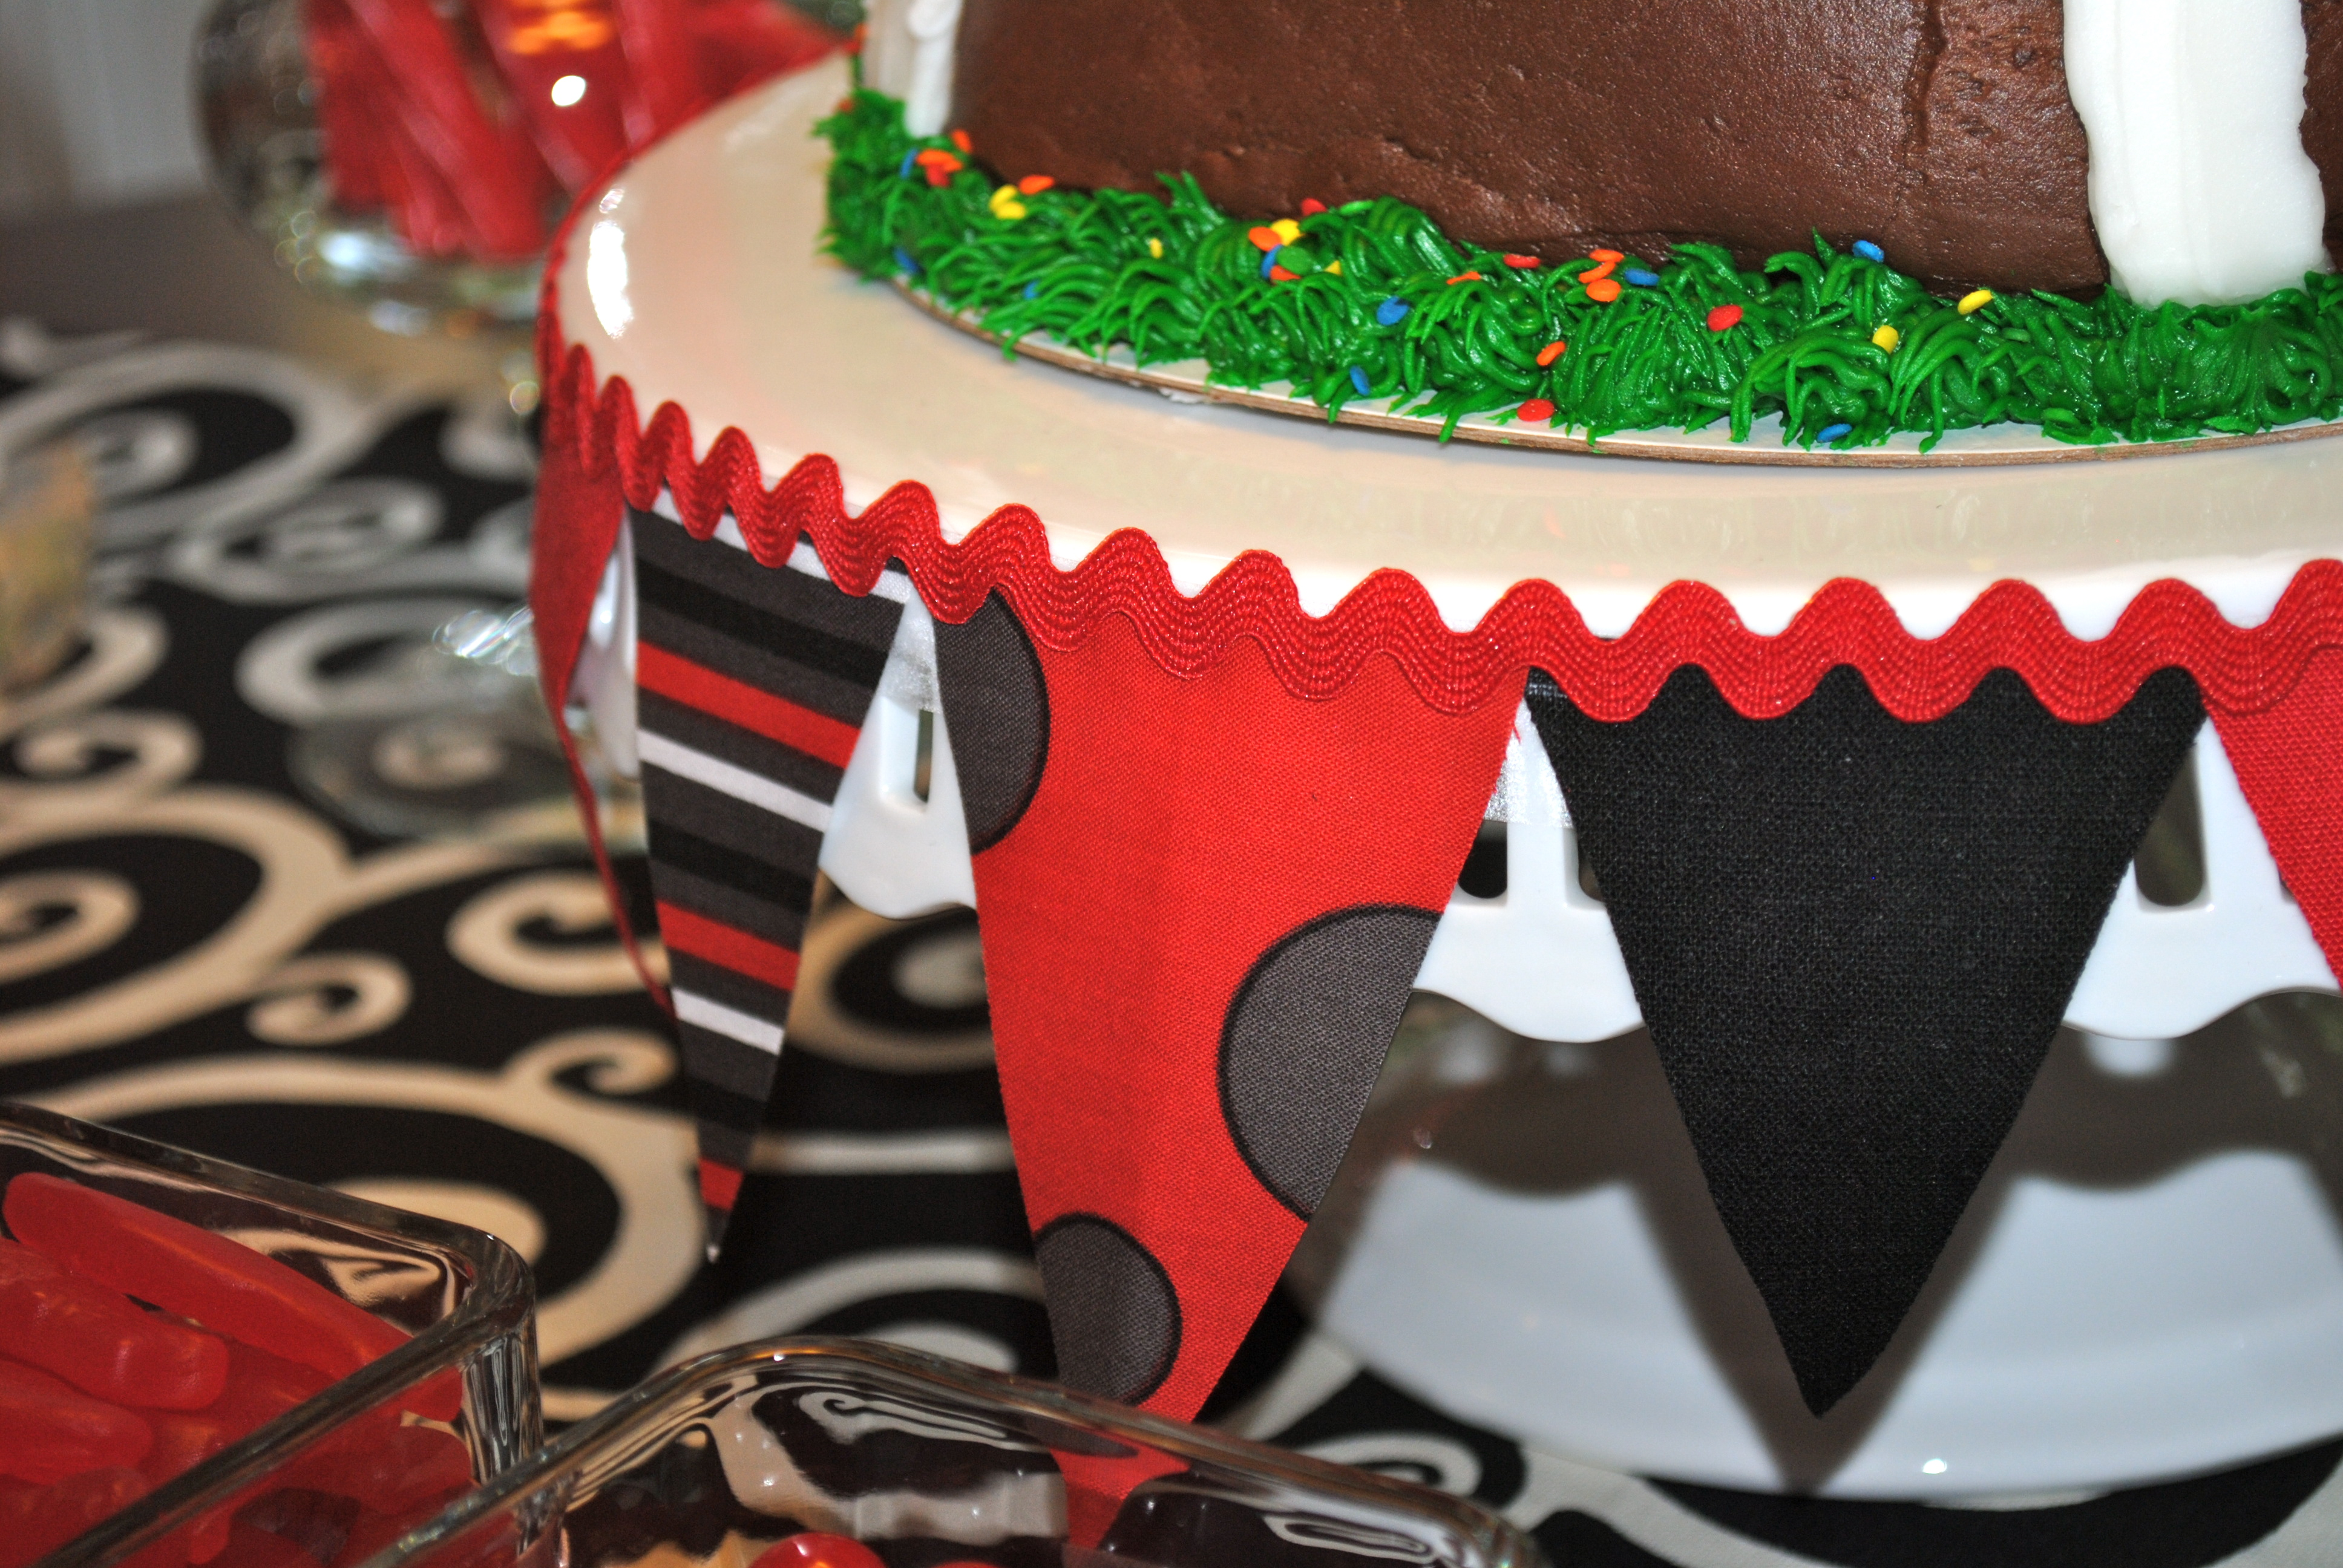 My Parties Uga Opening Game Dessert Table